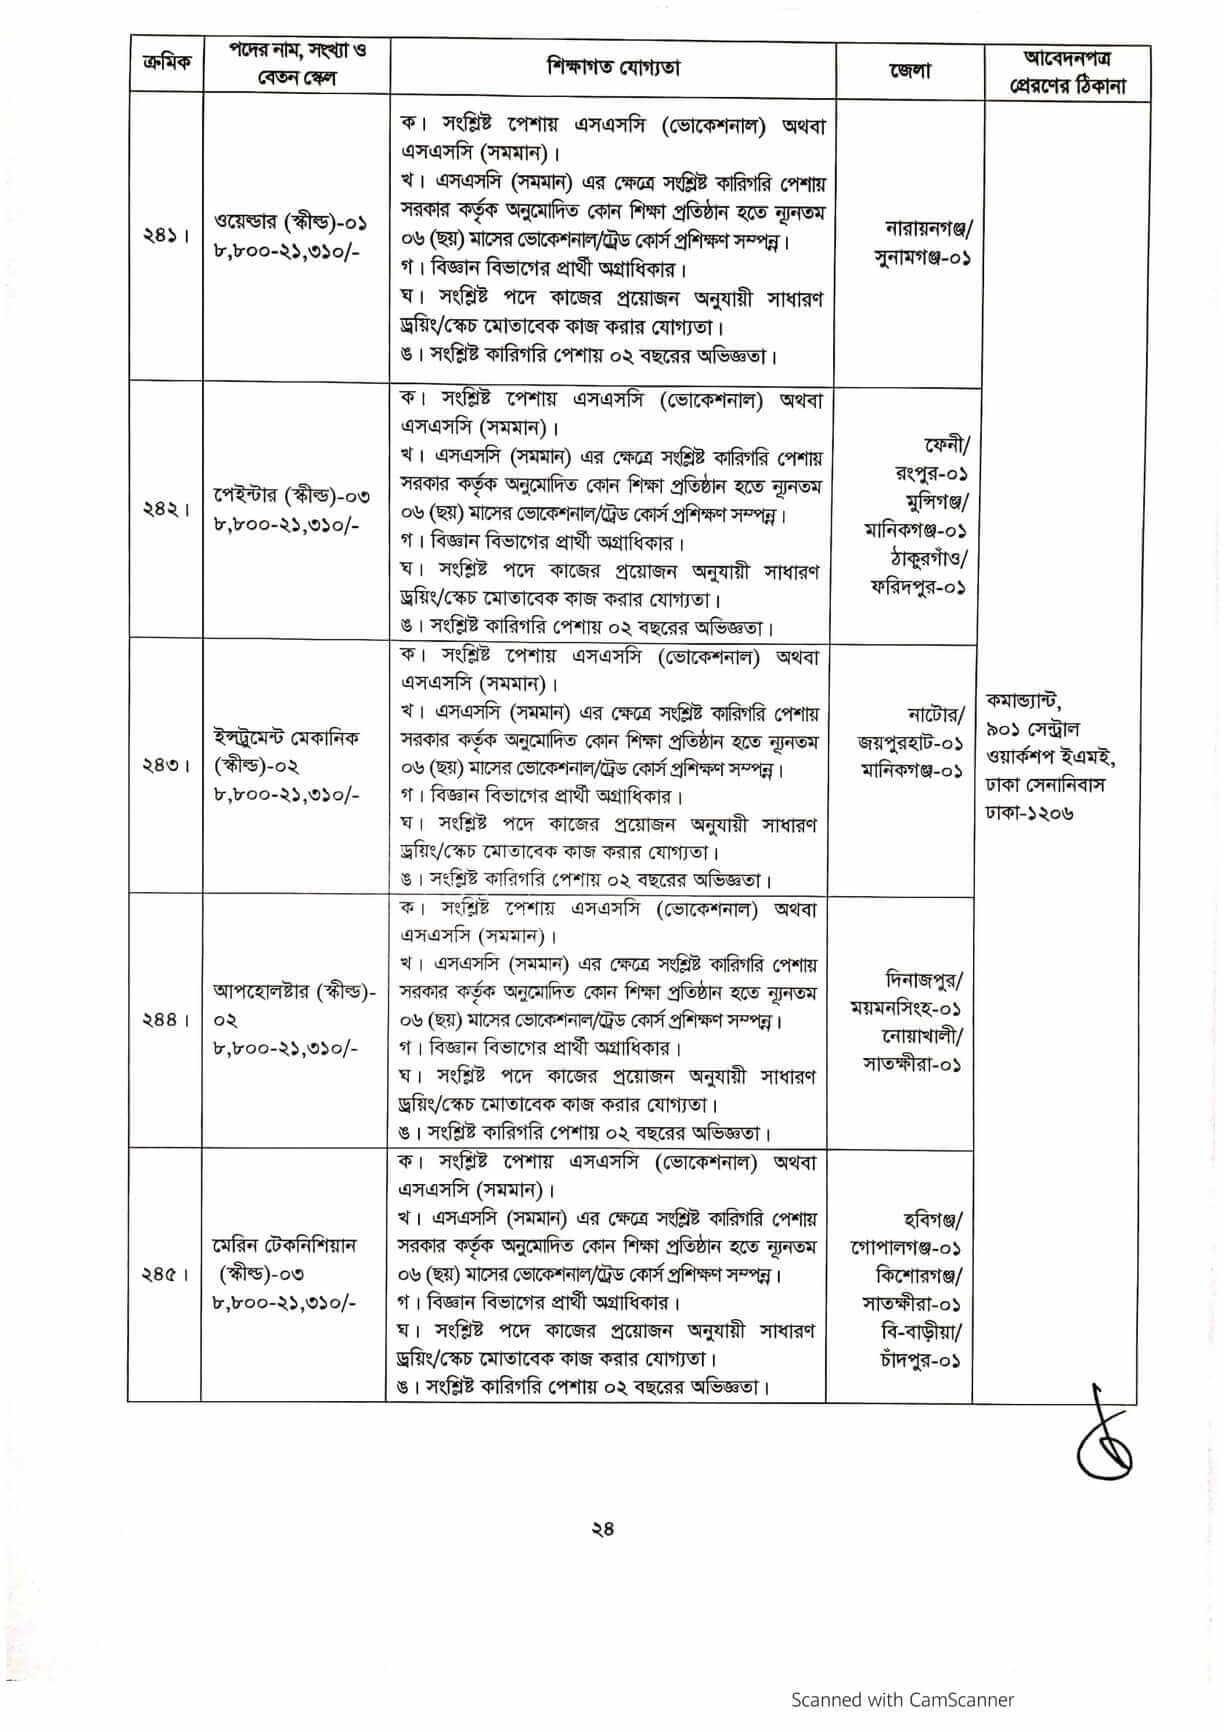 army.mil.bd job circular 2021